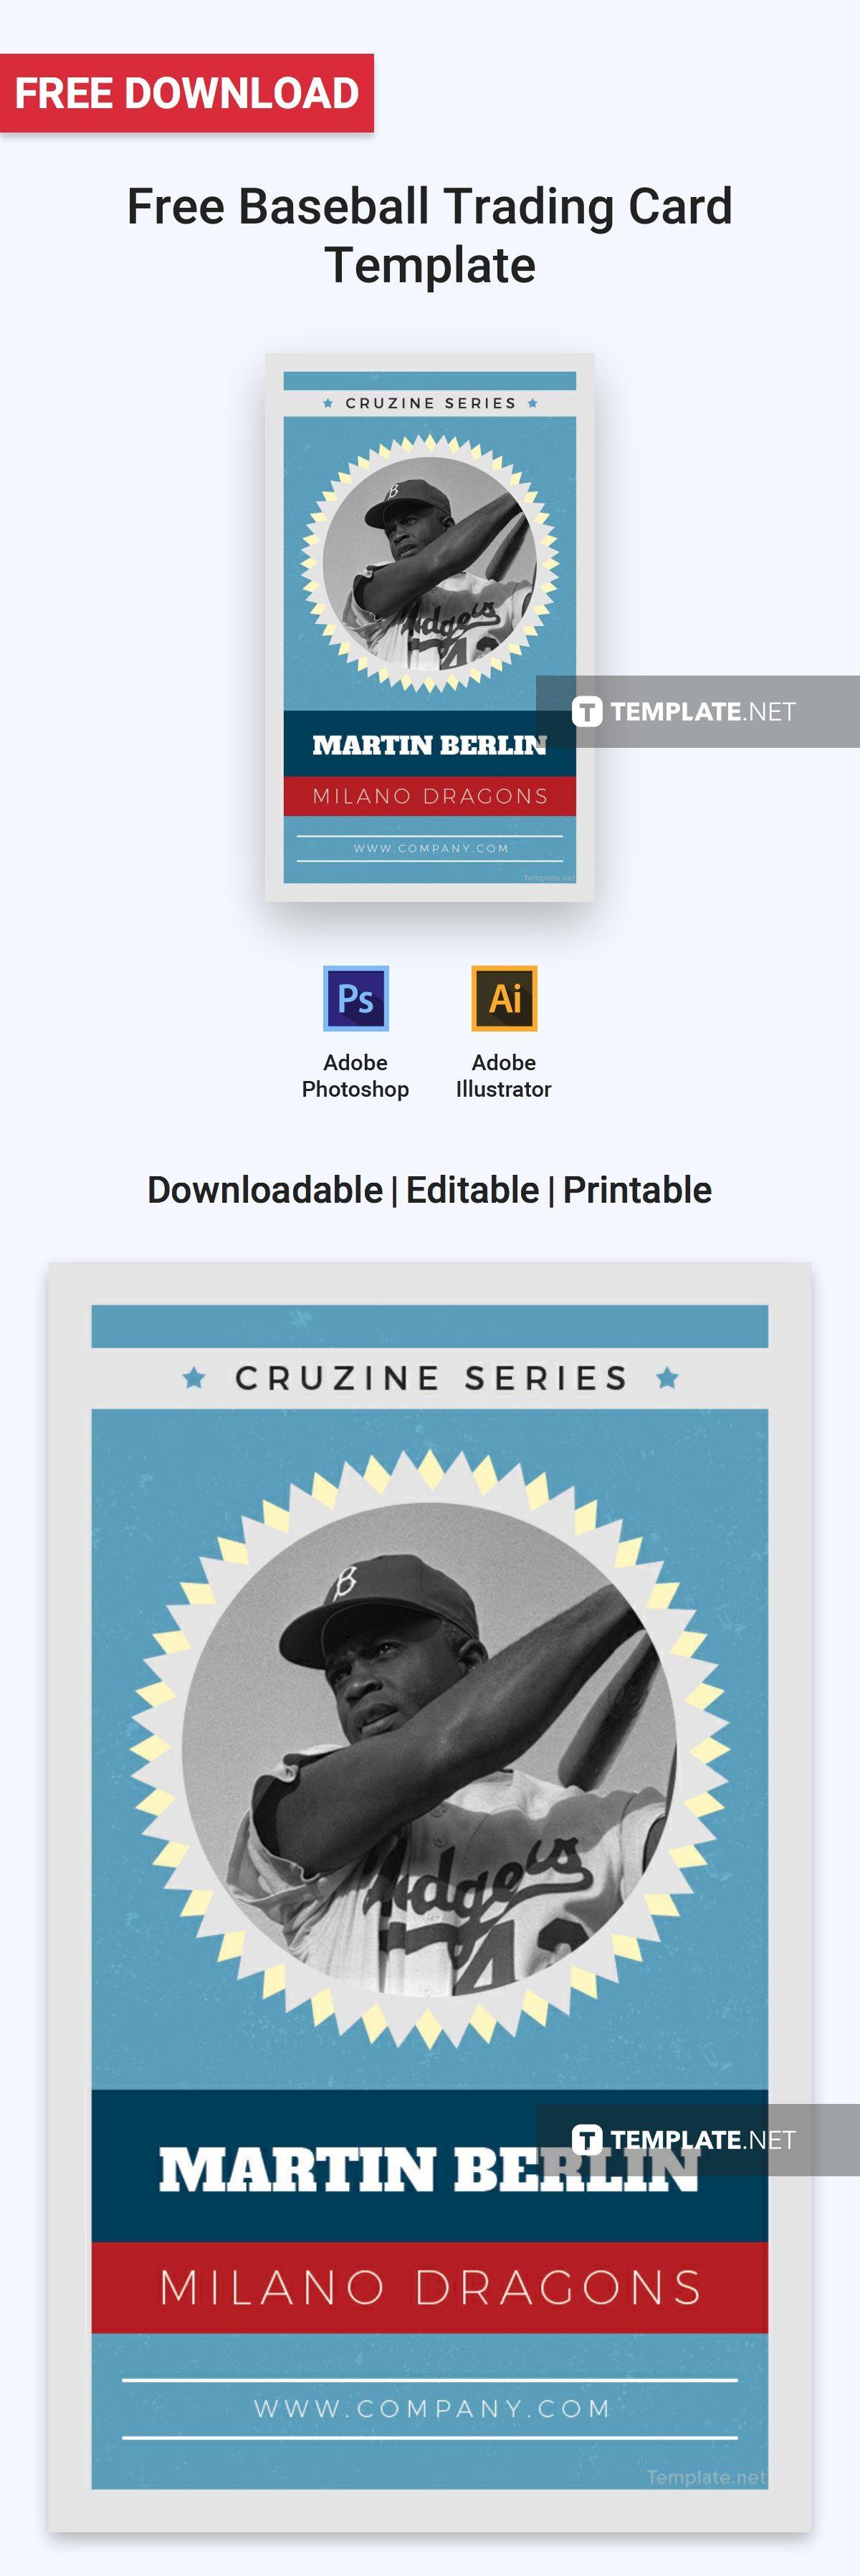 Free Baseball Trading Card Template Baseball Trading Cards Trading Card Template Cards